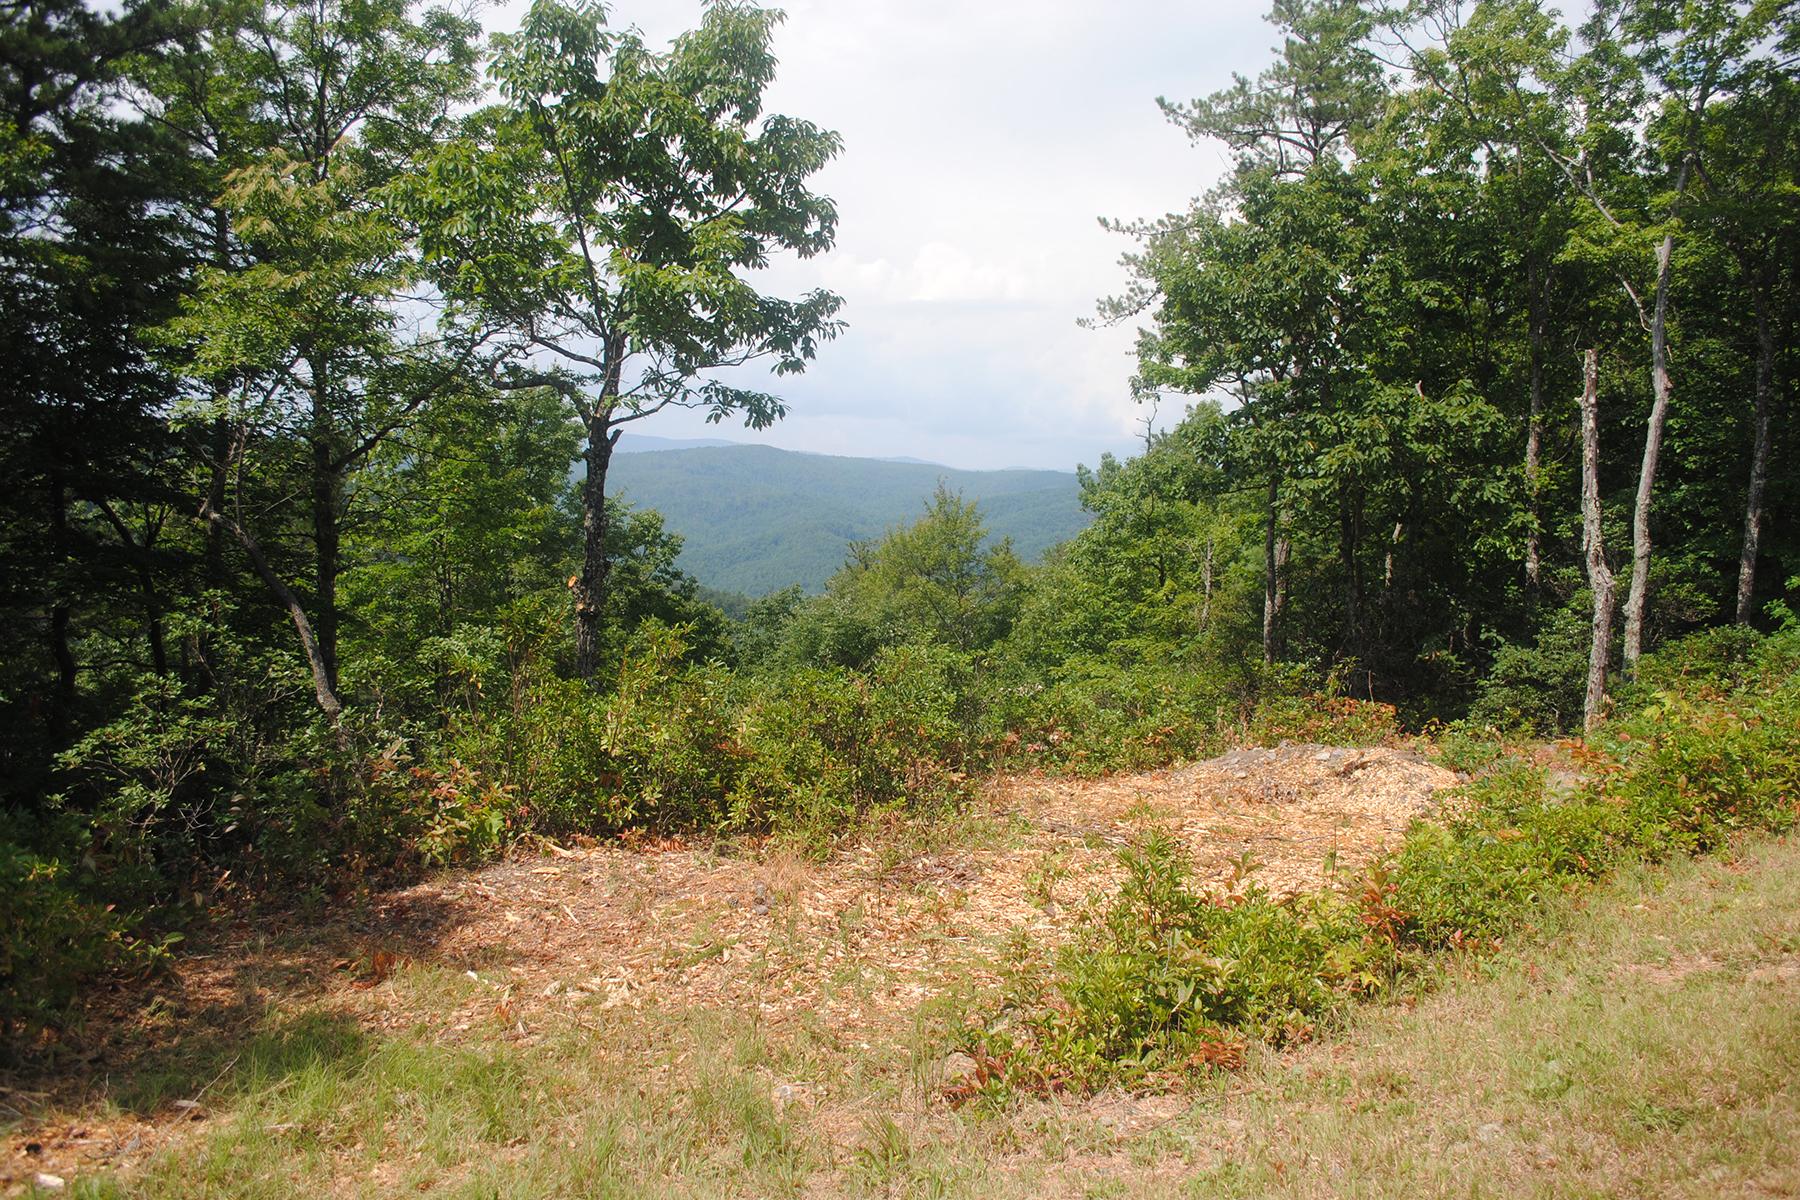 Land for Sale at LEATHERWOOD MOUNTAIN - FERGUSON Lot 57 Elkhorn Rd Ferguson, North Carolina 28624 United States